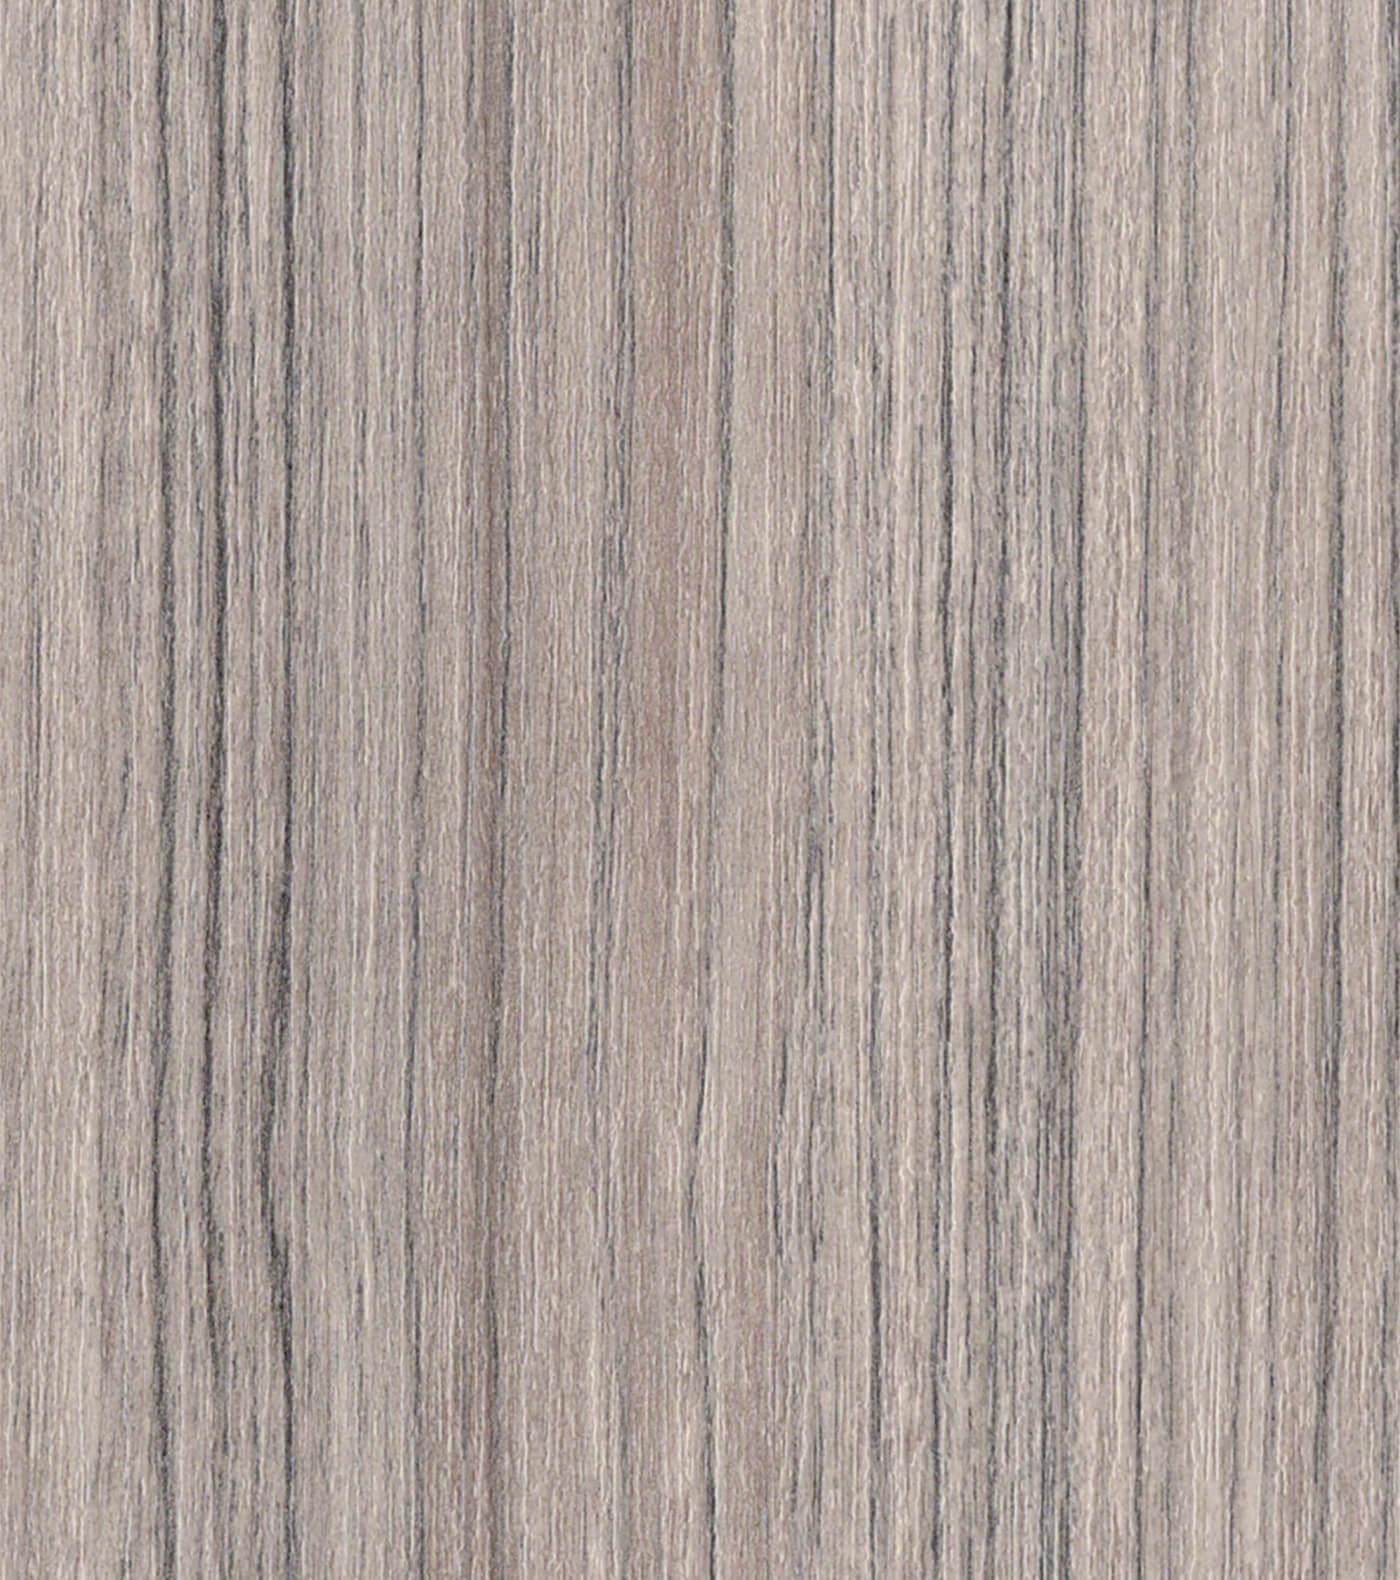 Silvered Textured TFL